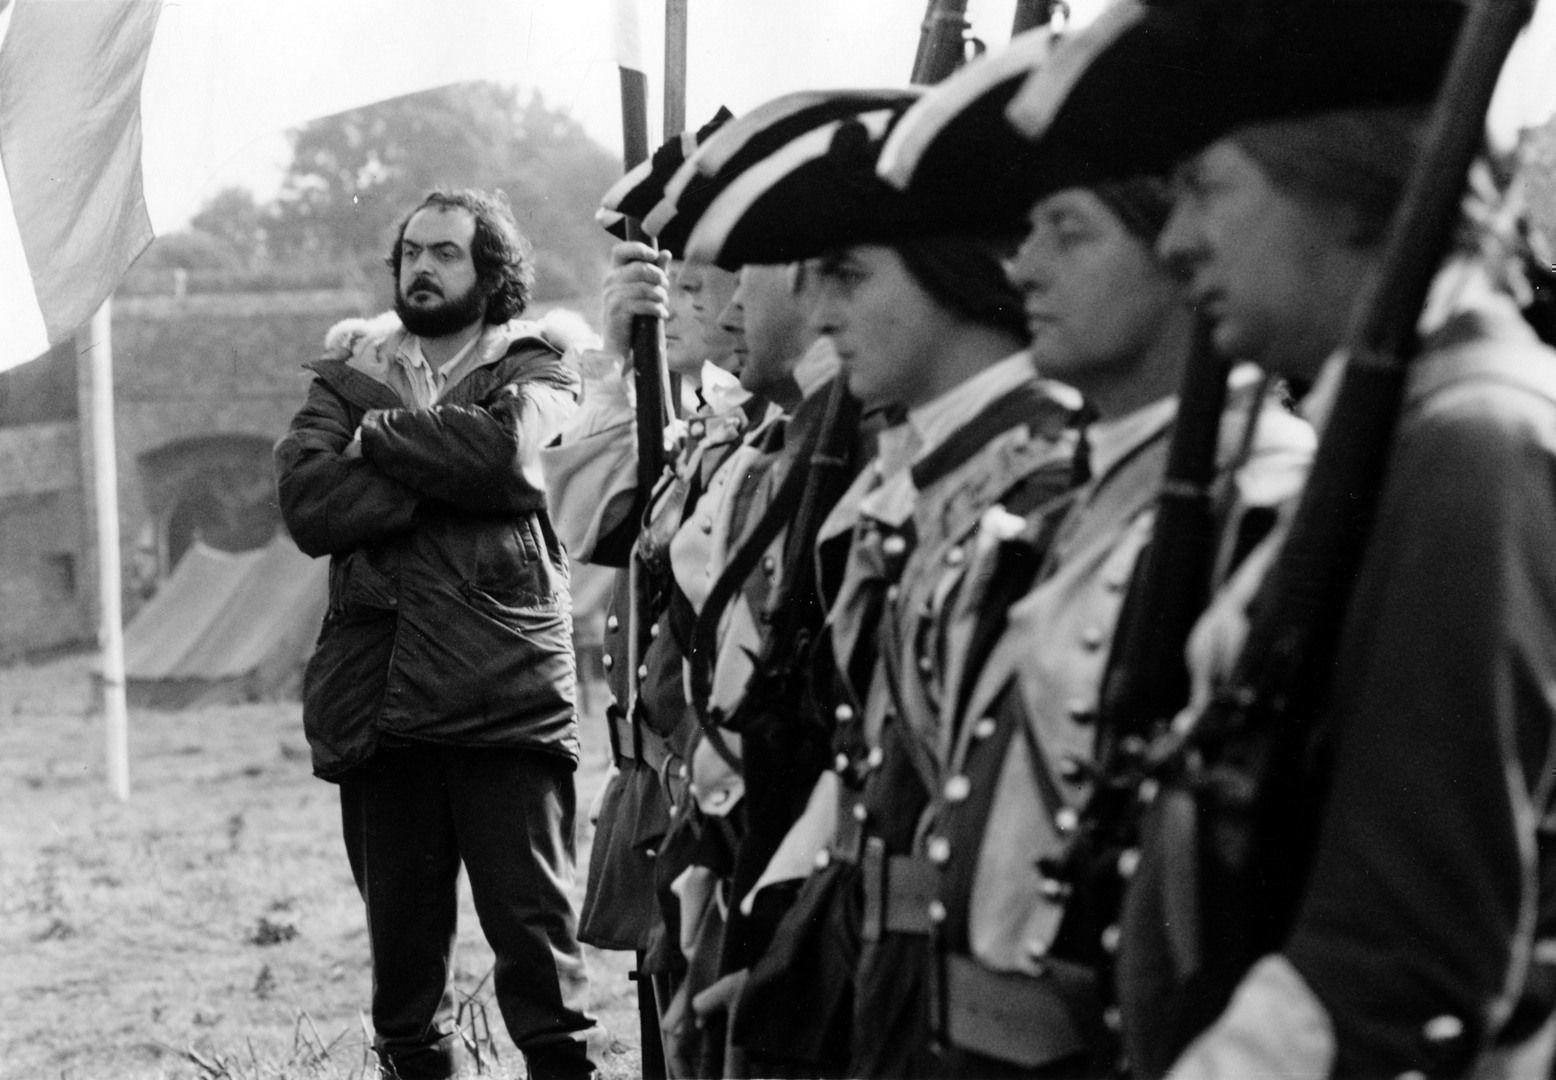 Stanley Kubrick on the set of Barry Lyndon